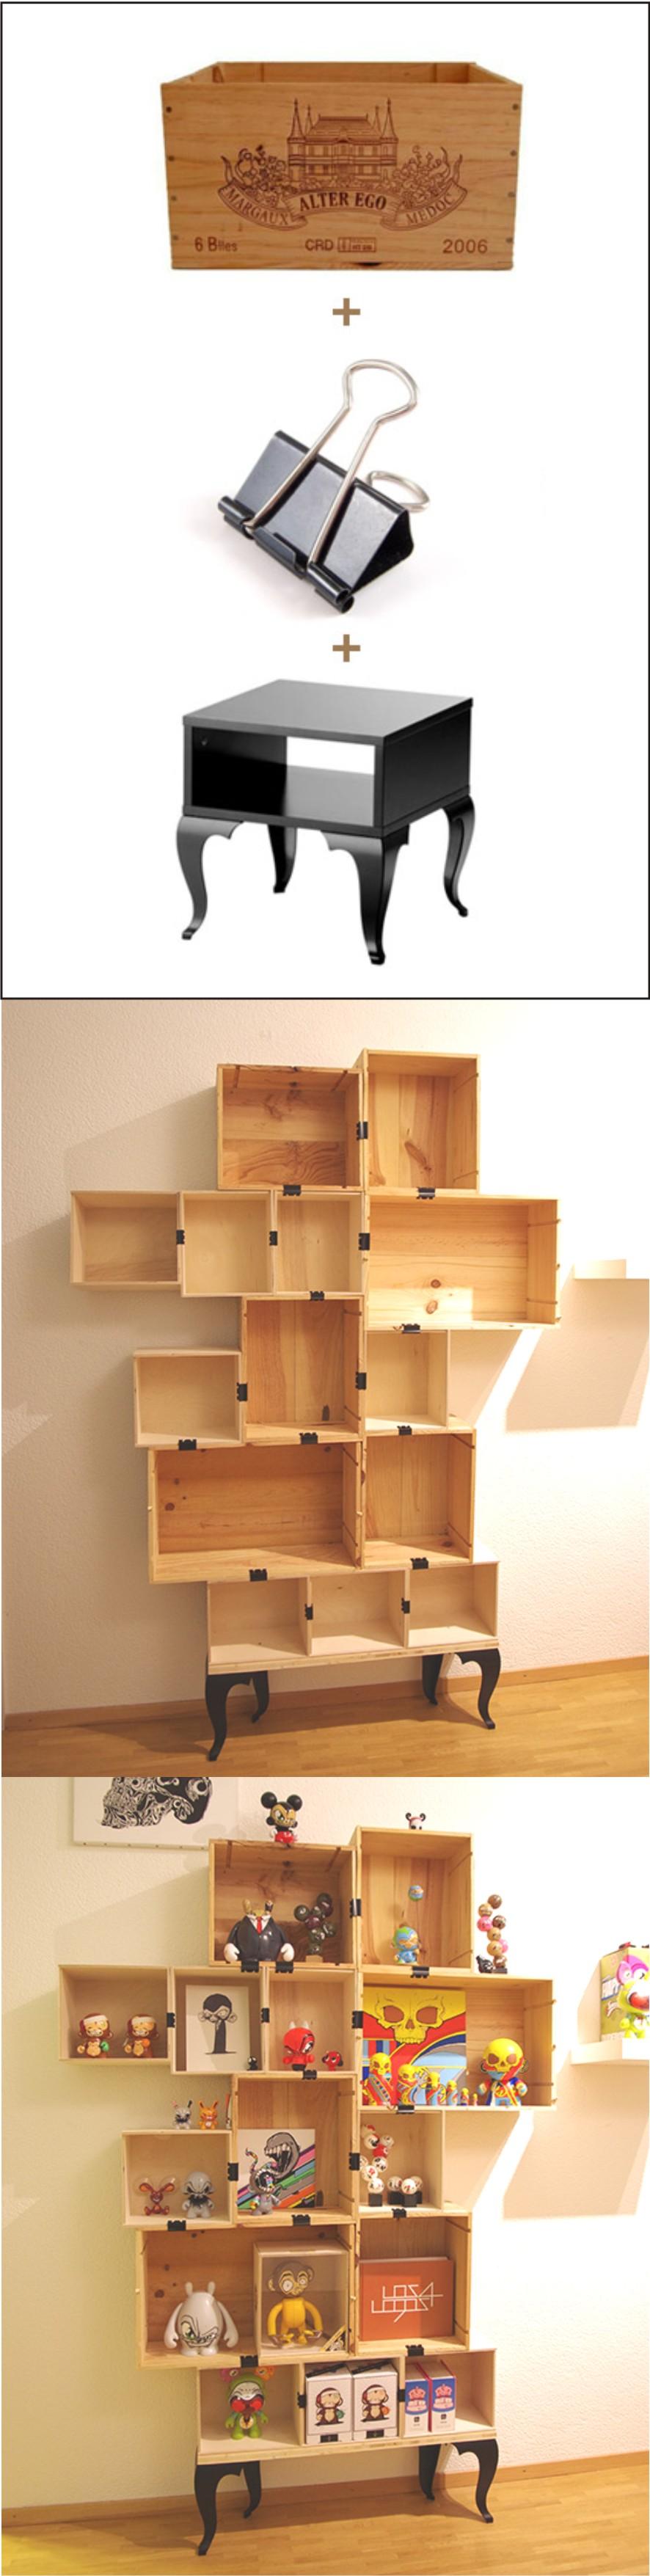 Ingeniosa estantería con cajas de vino | Cajas de vino, Estanterías ...